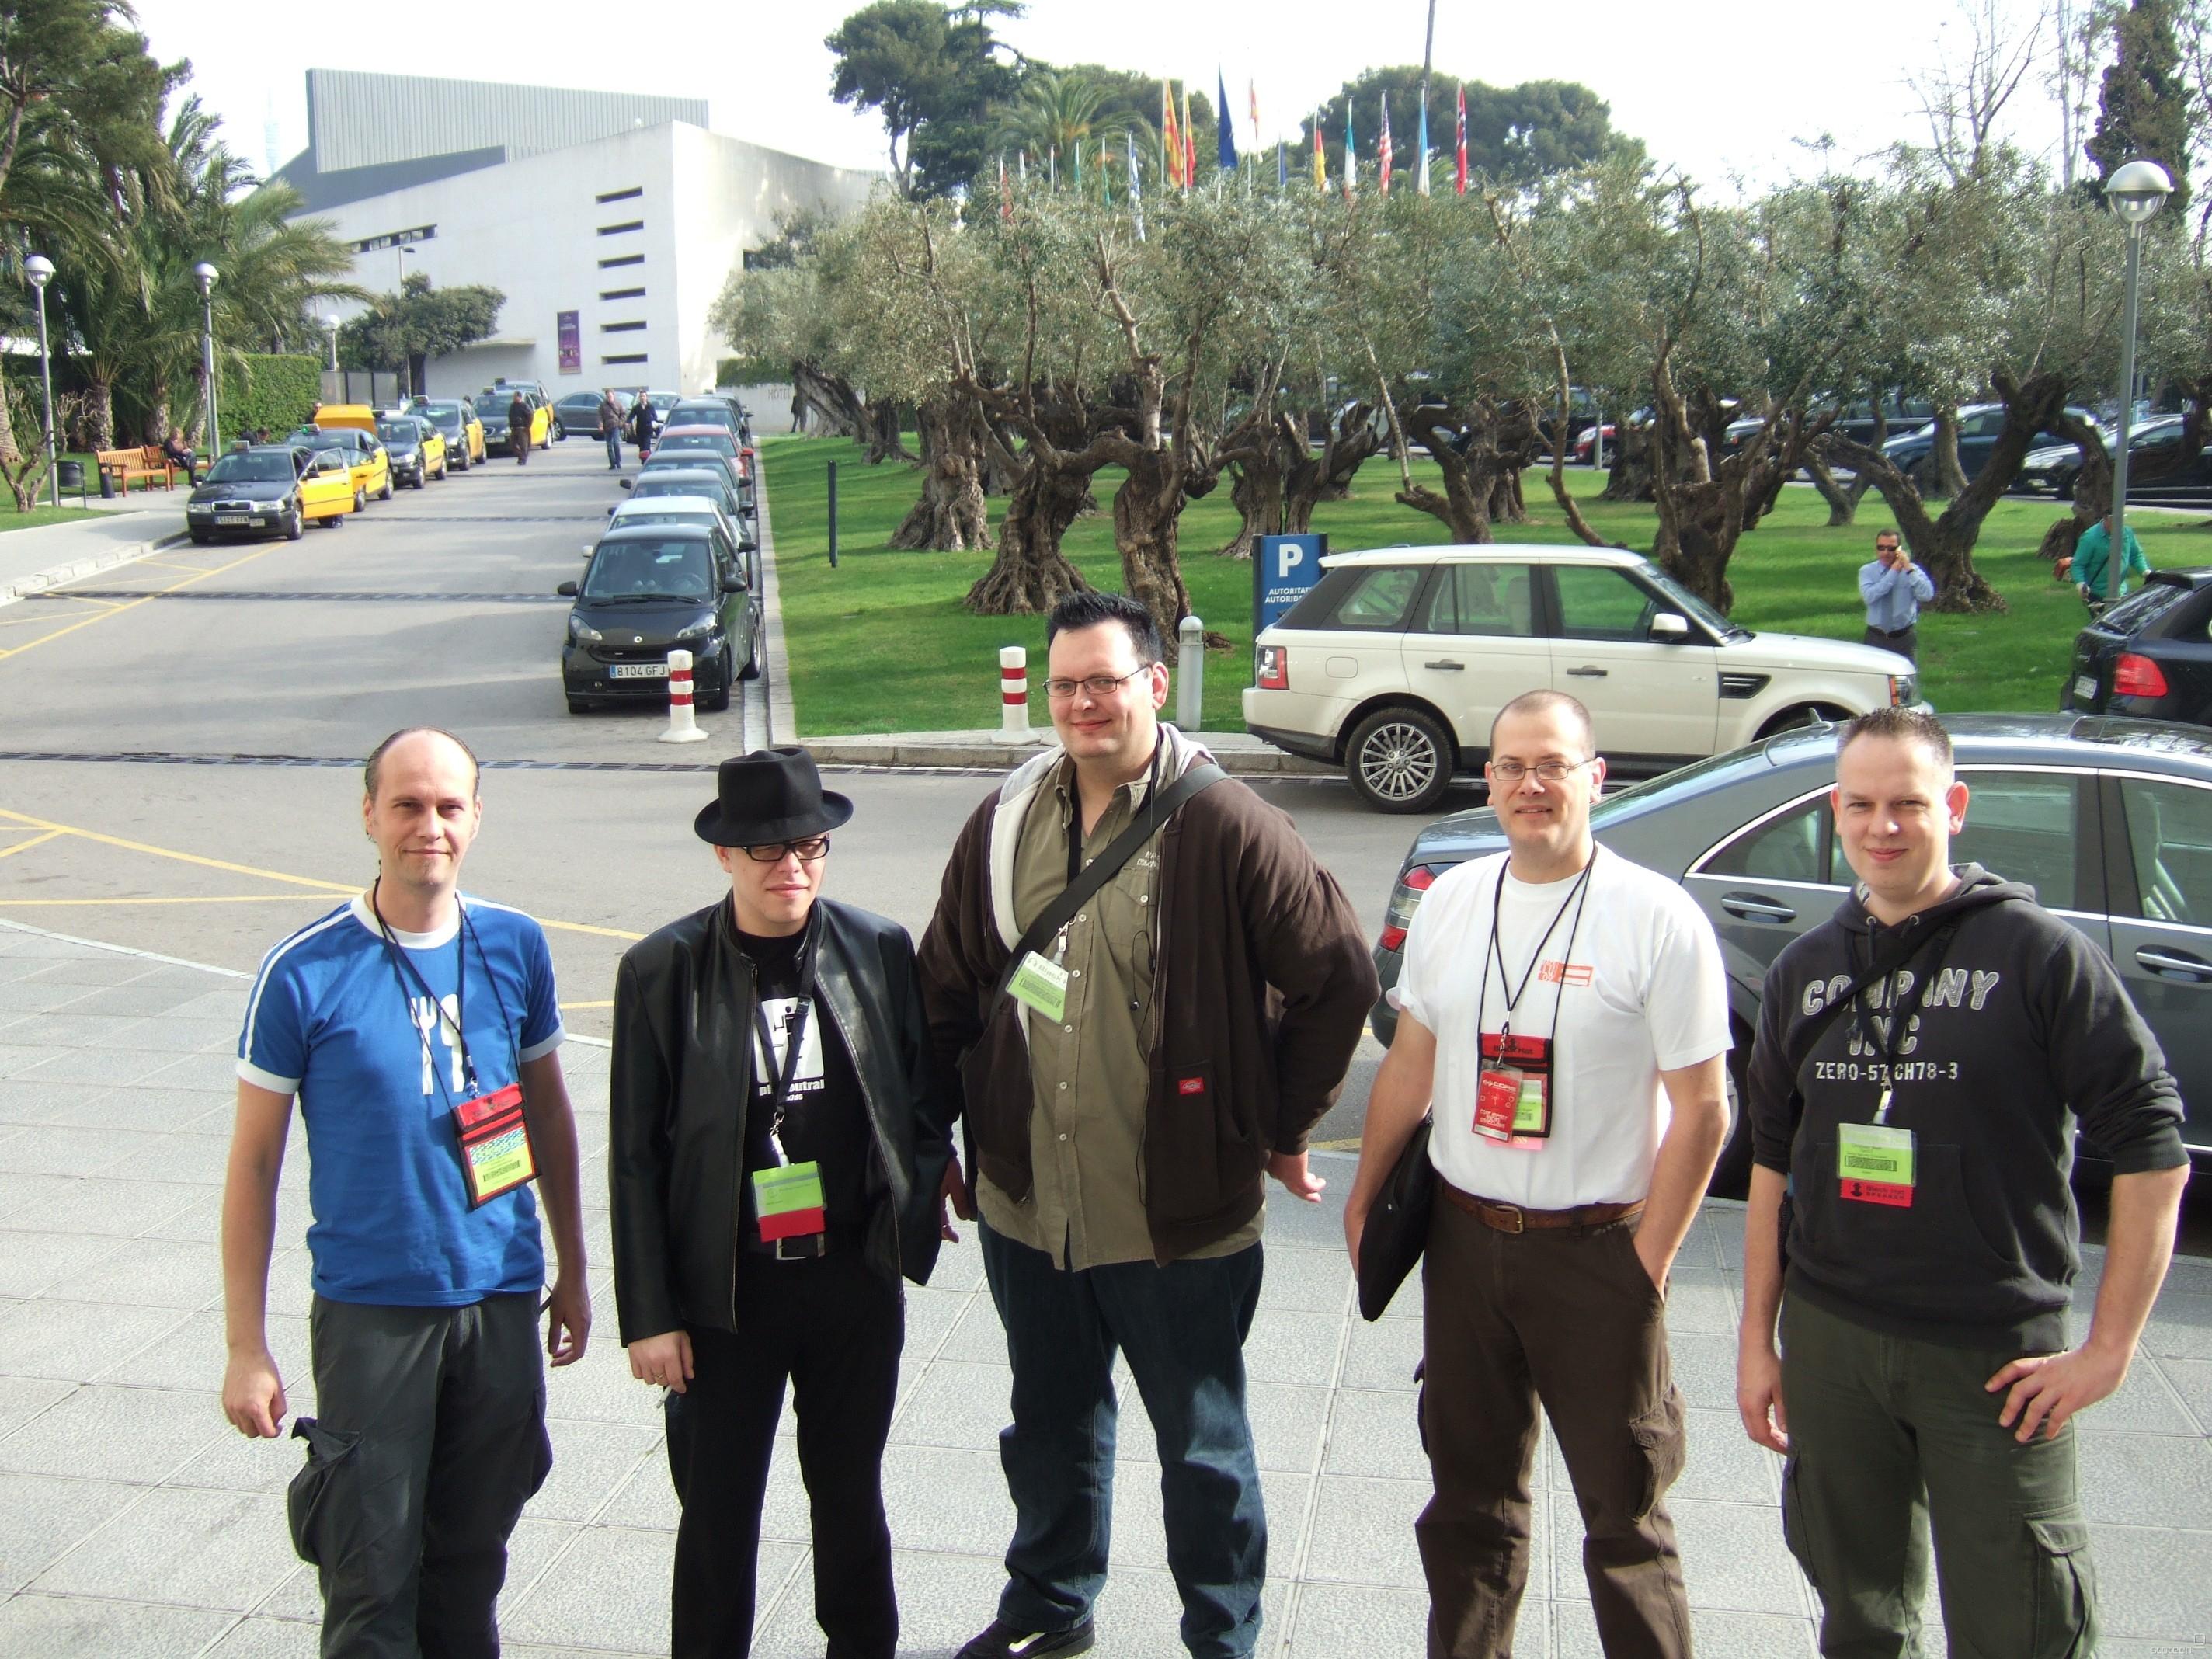 BlackHatEU (L to R): Peter Van Eeckhoutte, FX, Atilla, Xavier Mertens, Christiaan Beek Credit: ate